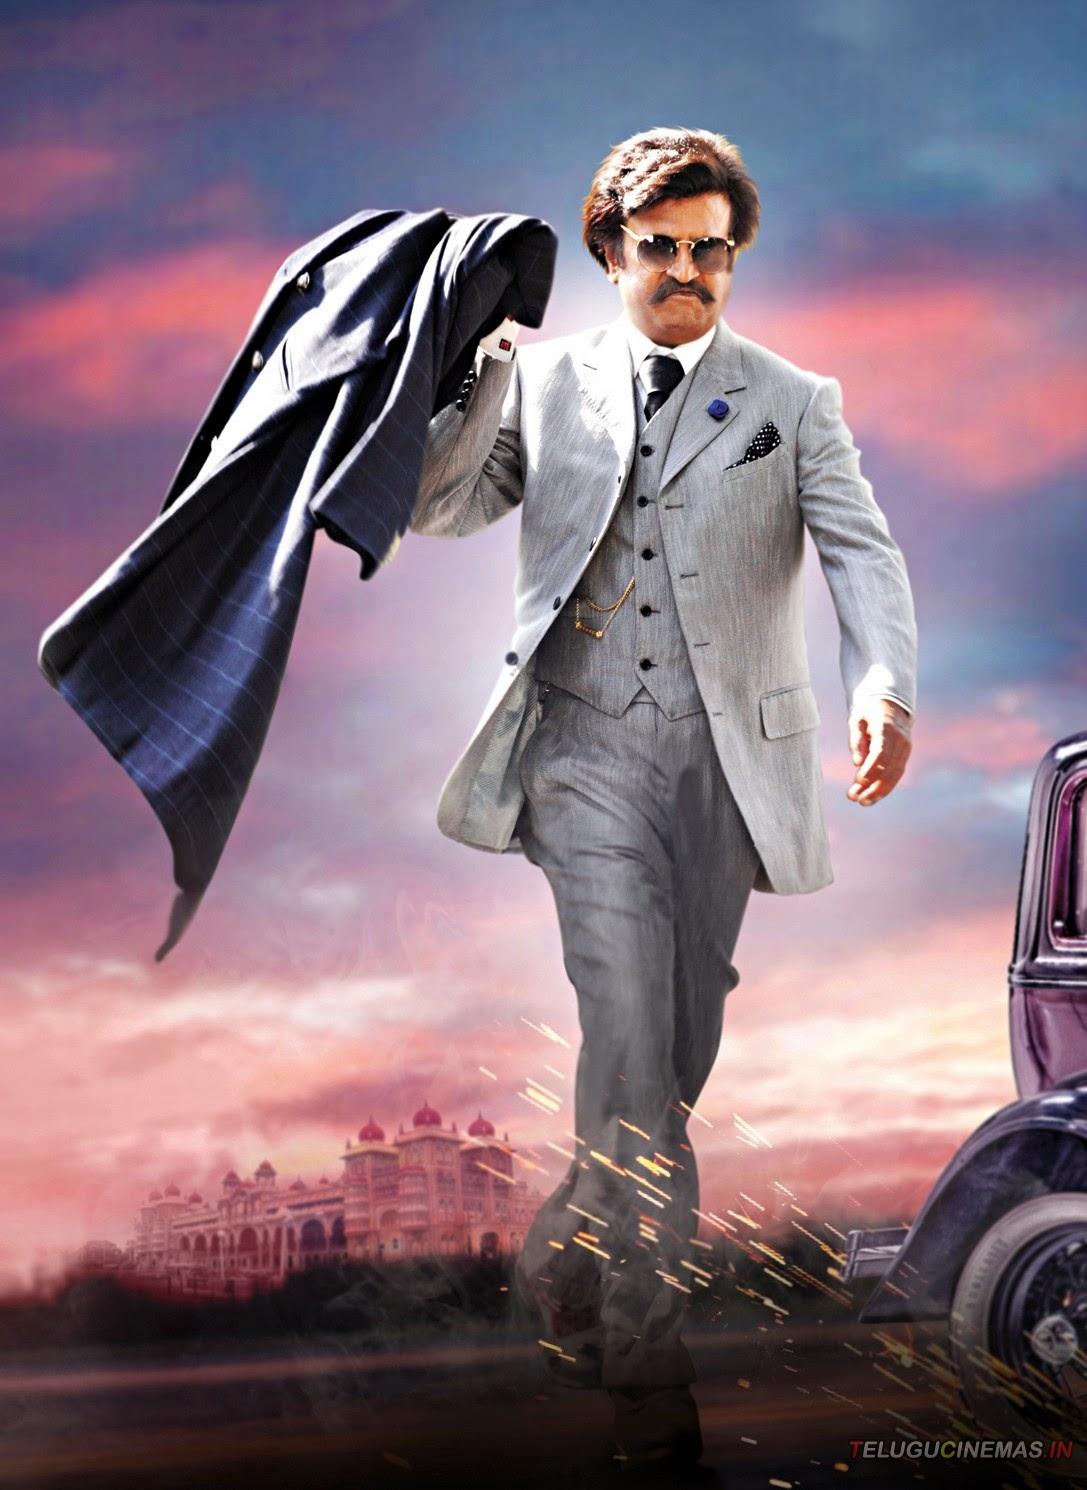 Lingaa Audio Release Date - TeluguCinemas in | Telugu Cinemas